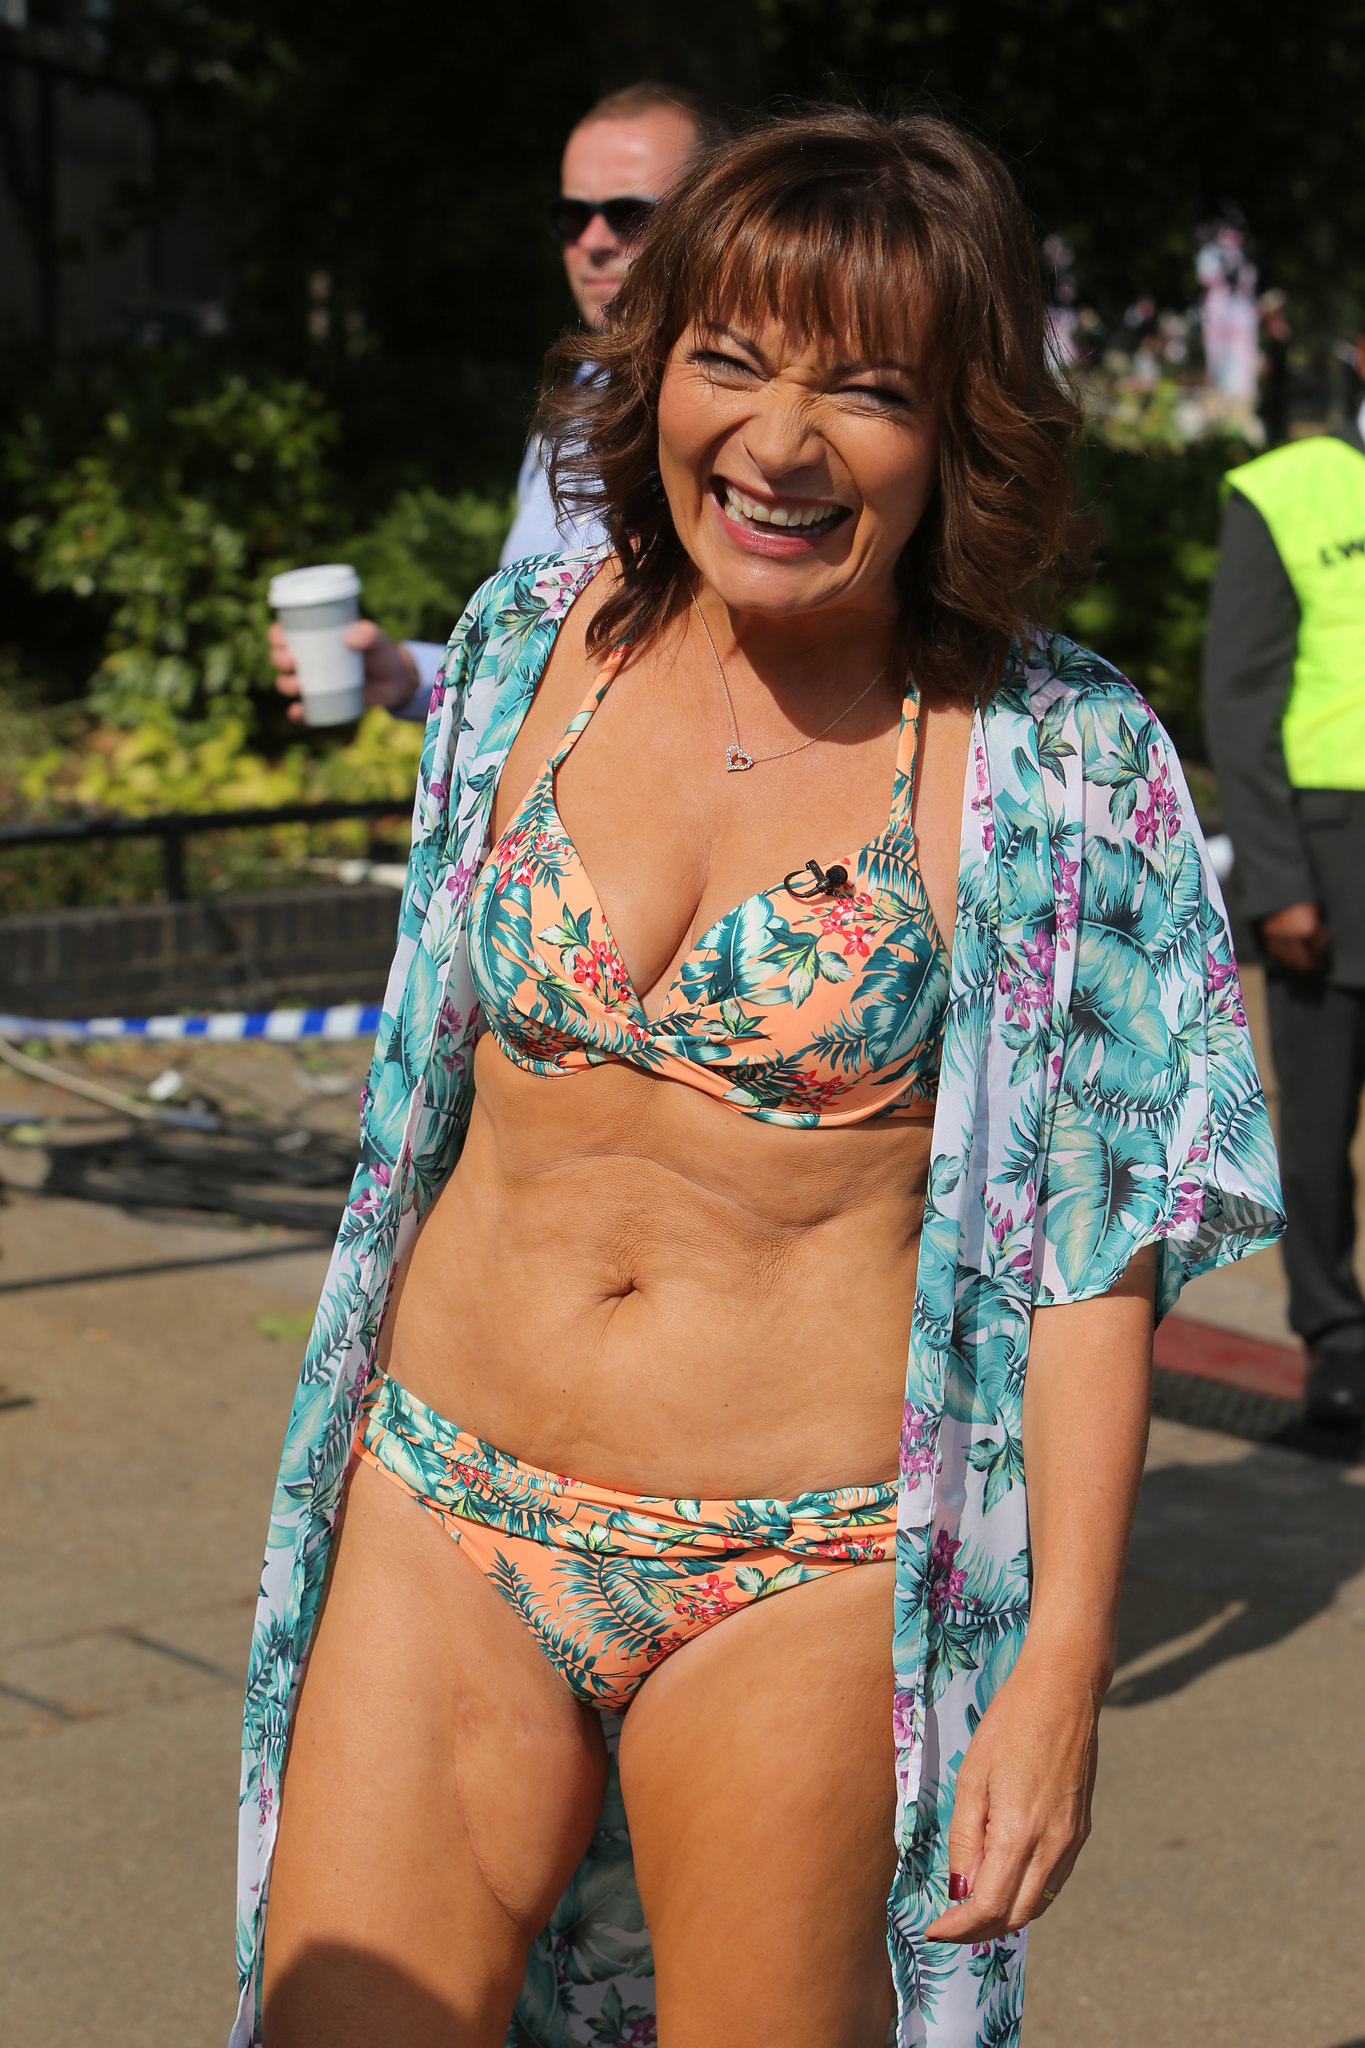 Lorraine Kelly Bikini Fotos